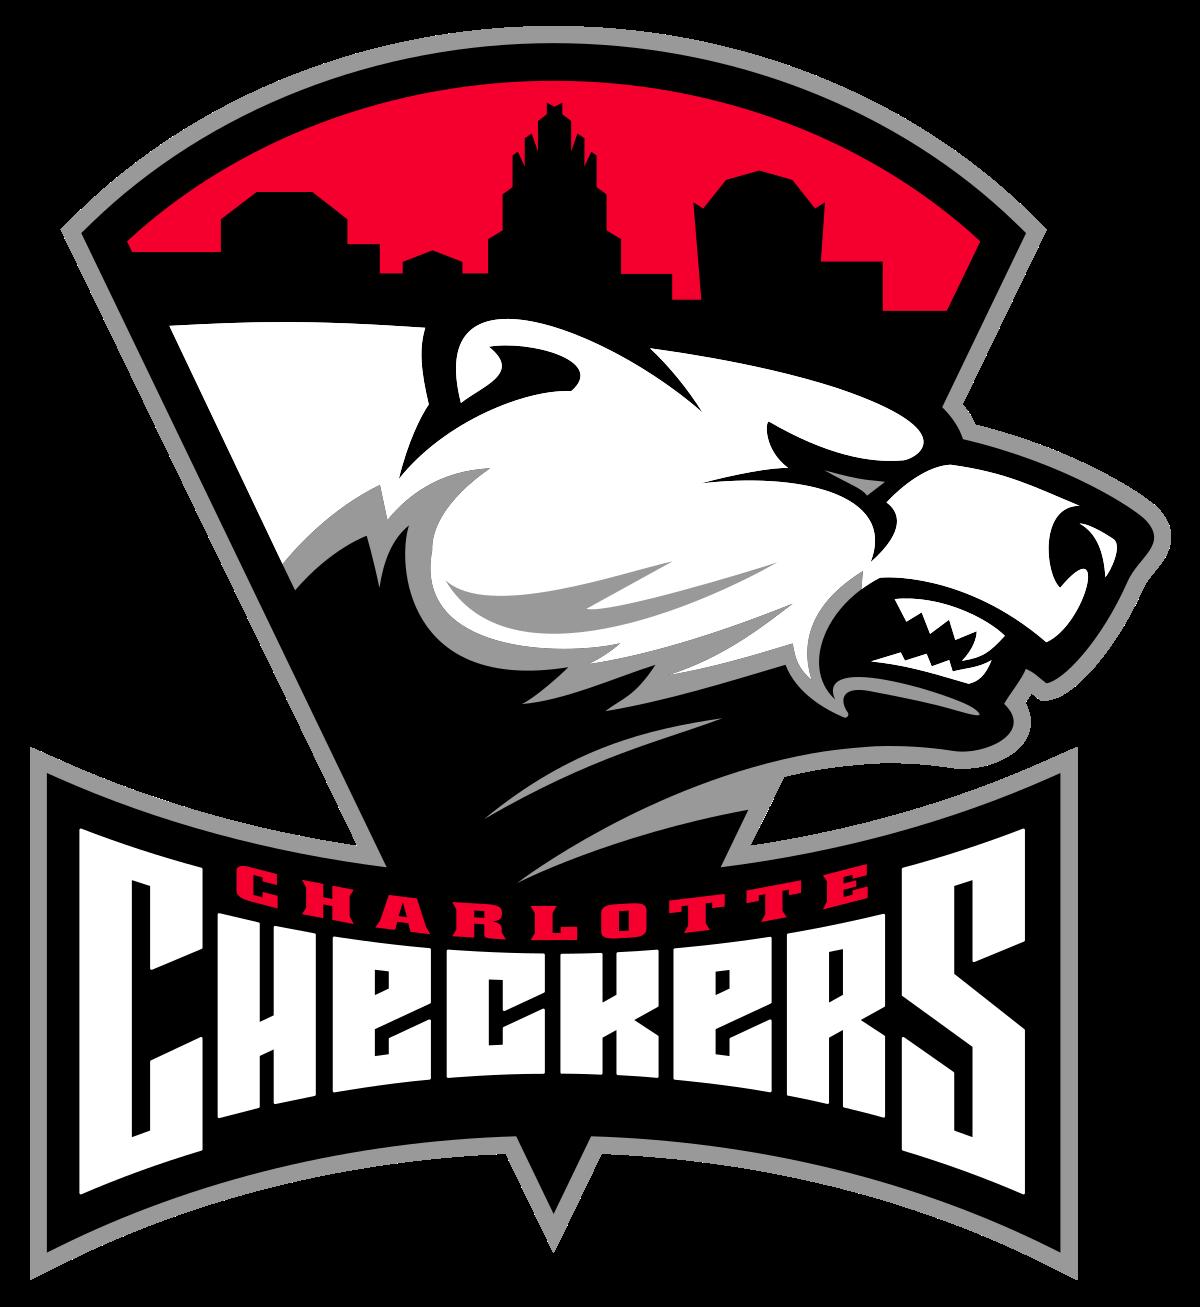 Charlotte Checkers.